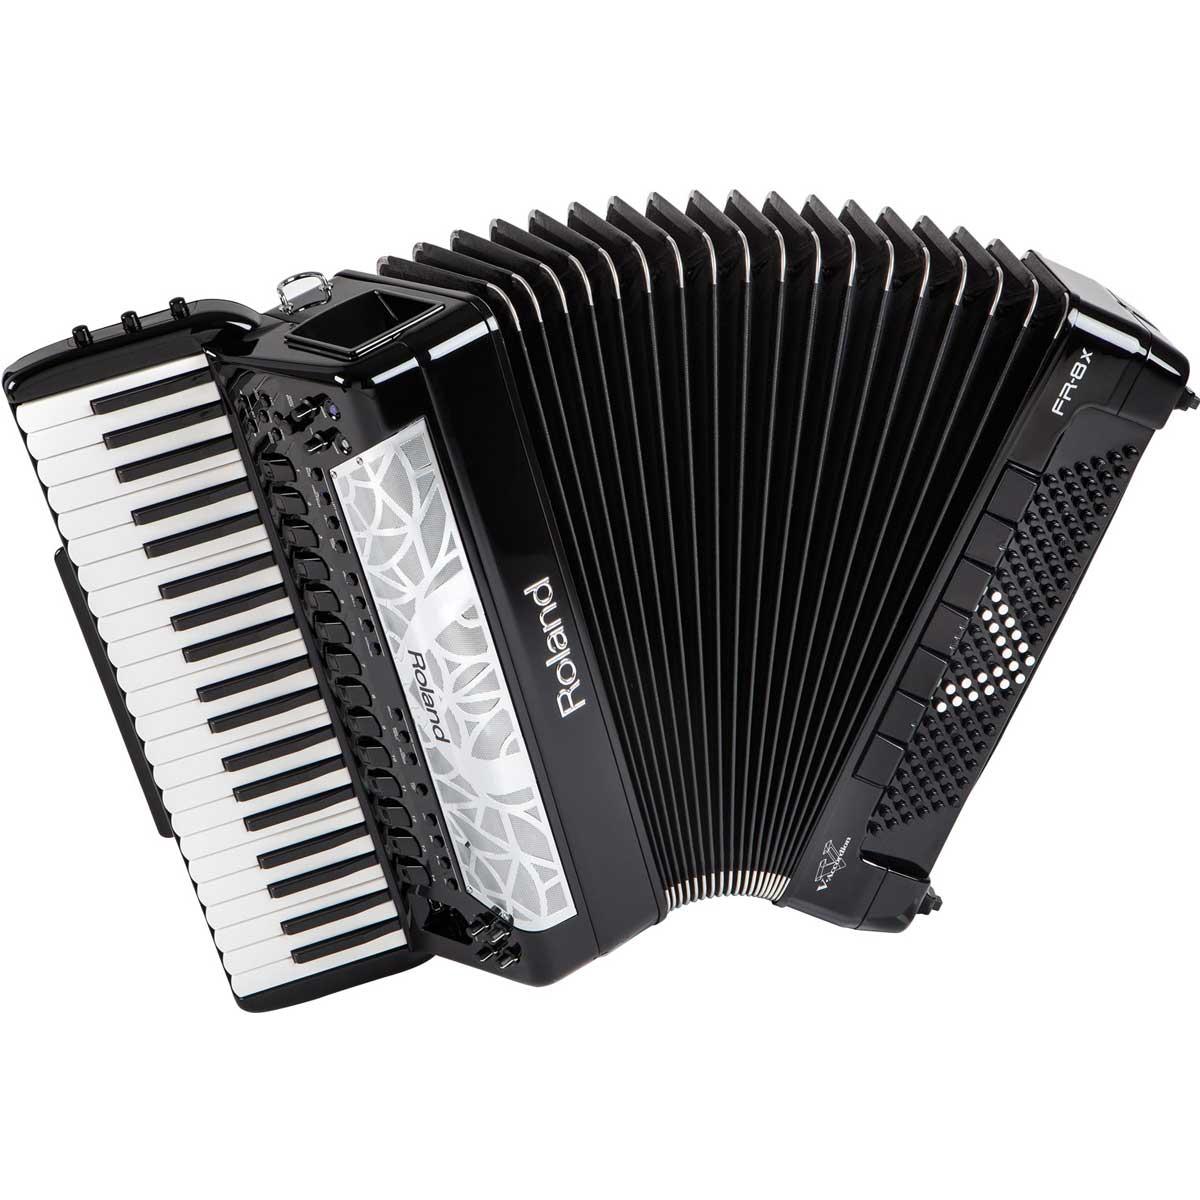 Roland ローランド / V-Accordion FR-8X BK ブラック Vアコーディオン ピアノ鍵盤タイプ【お取り寄せ商品】《納期別途ご案内》【YRK】